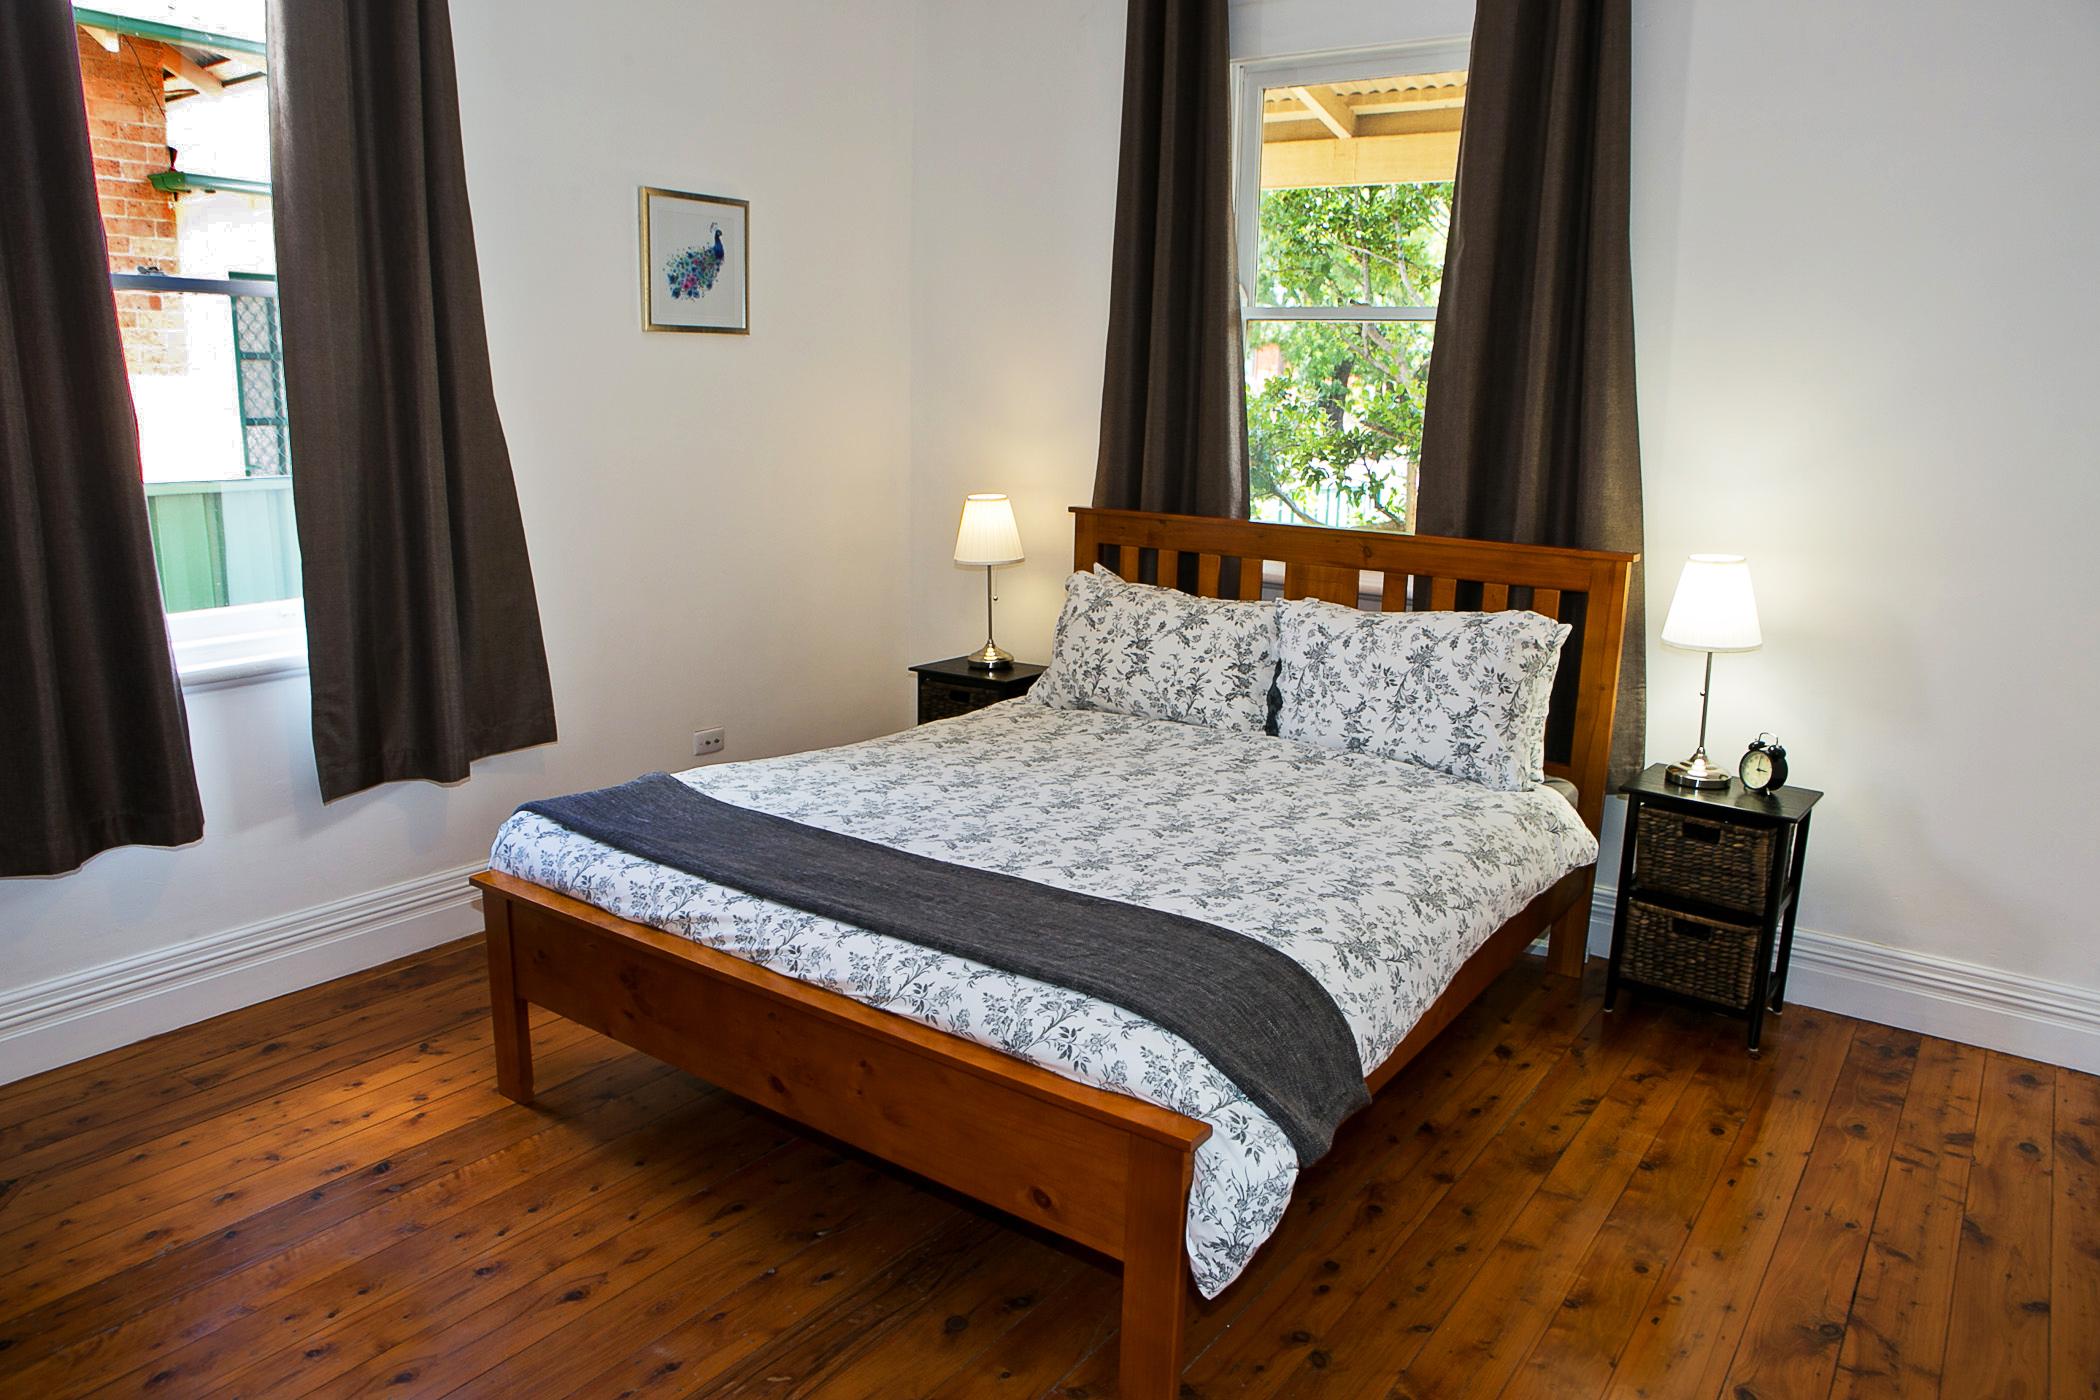 Dreamer's Cottage - Main Bedroom gallery image